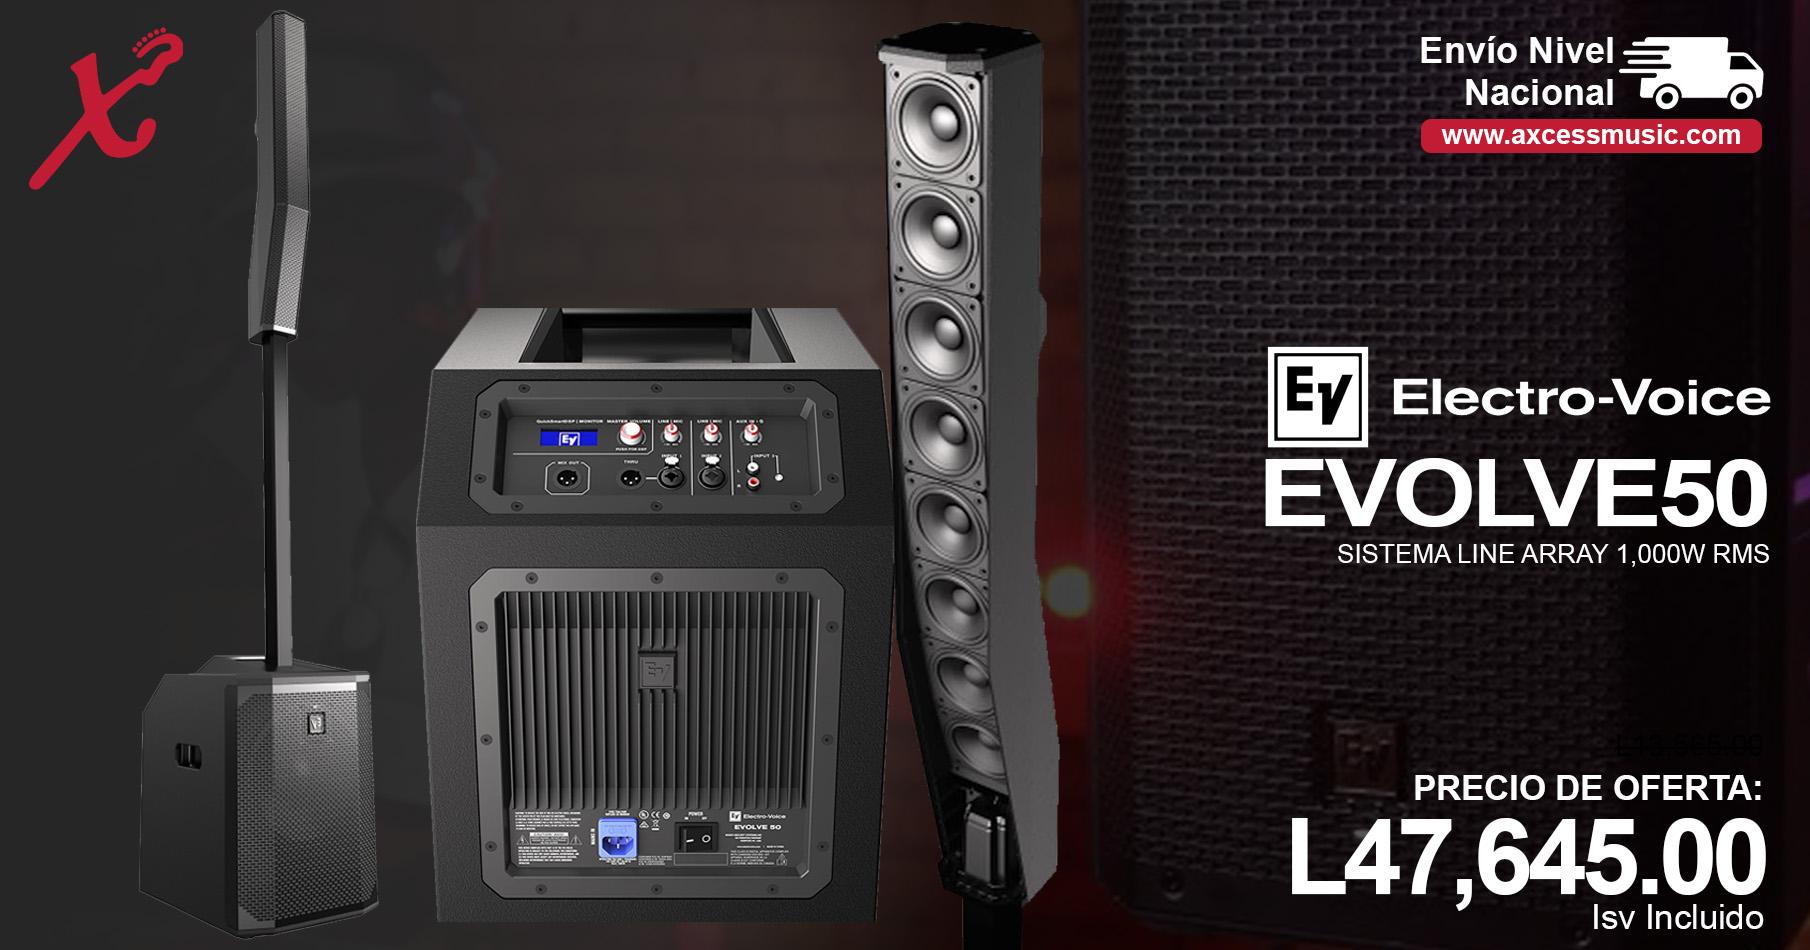 Evolve50 Facebook